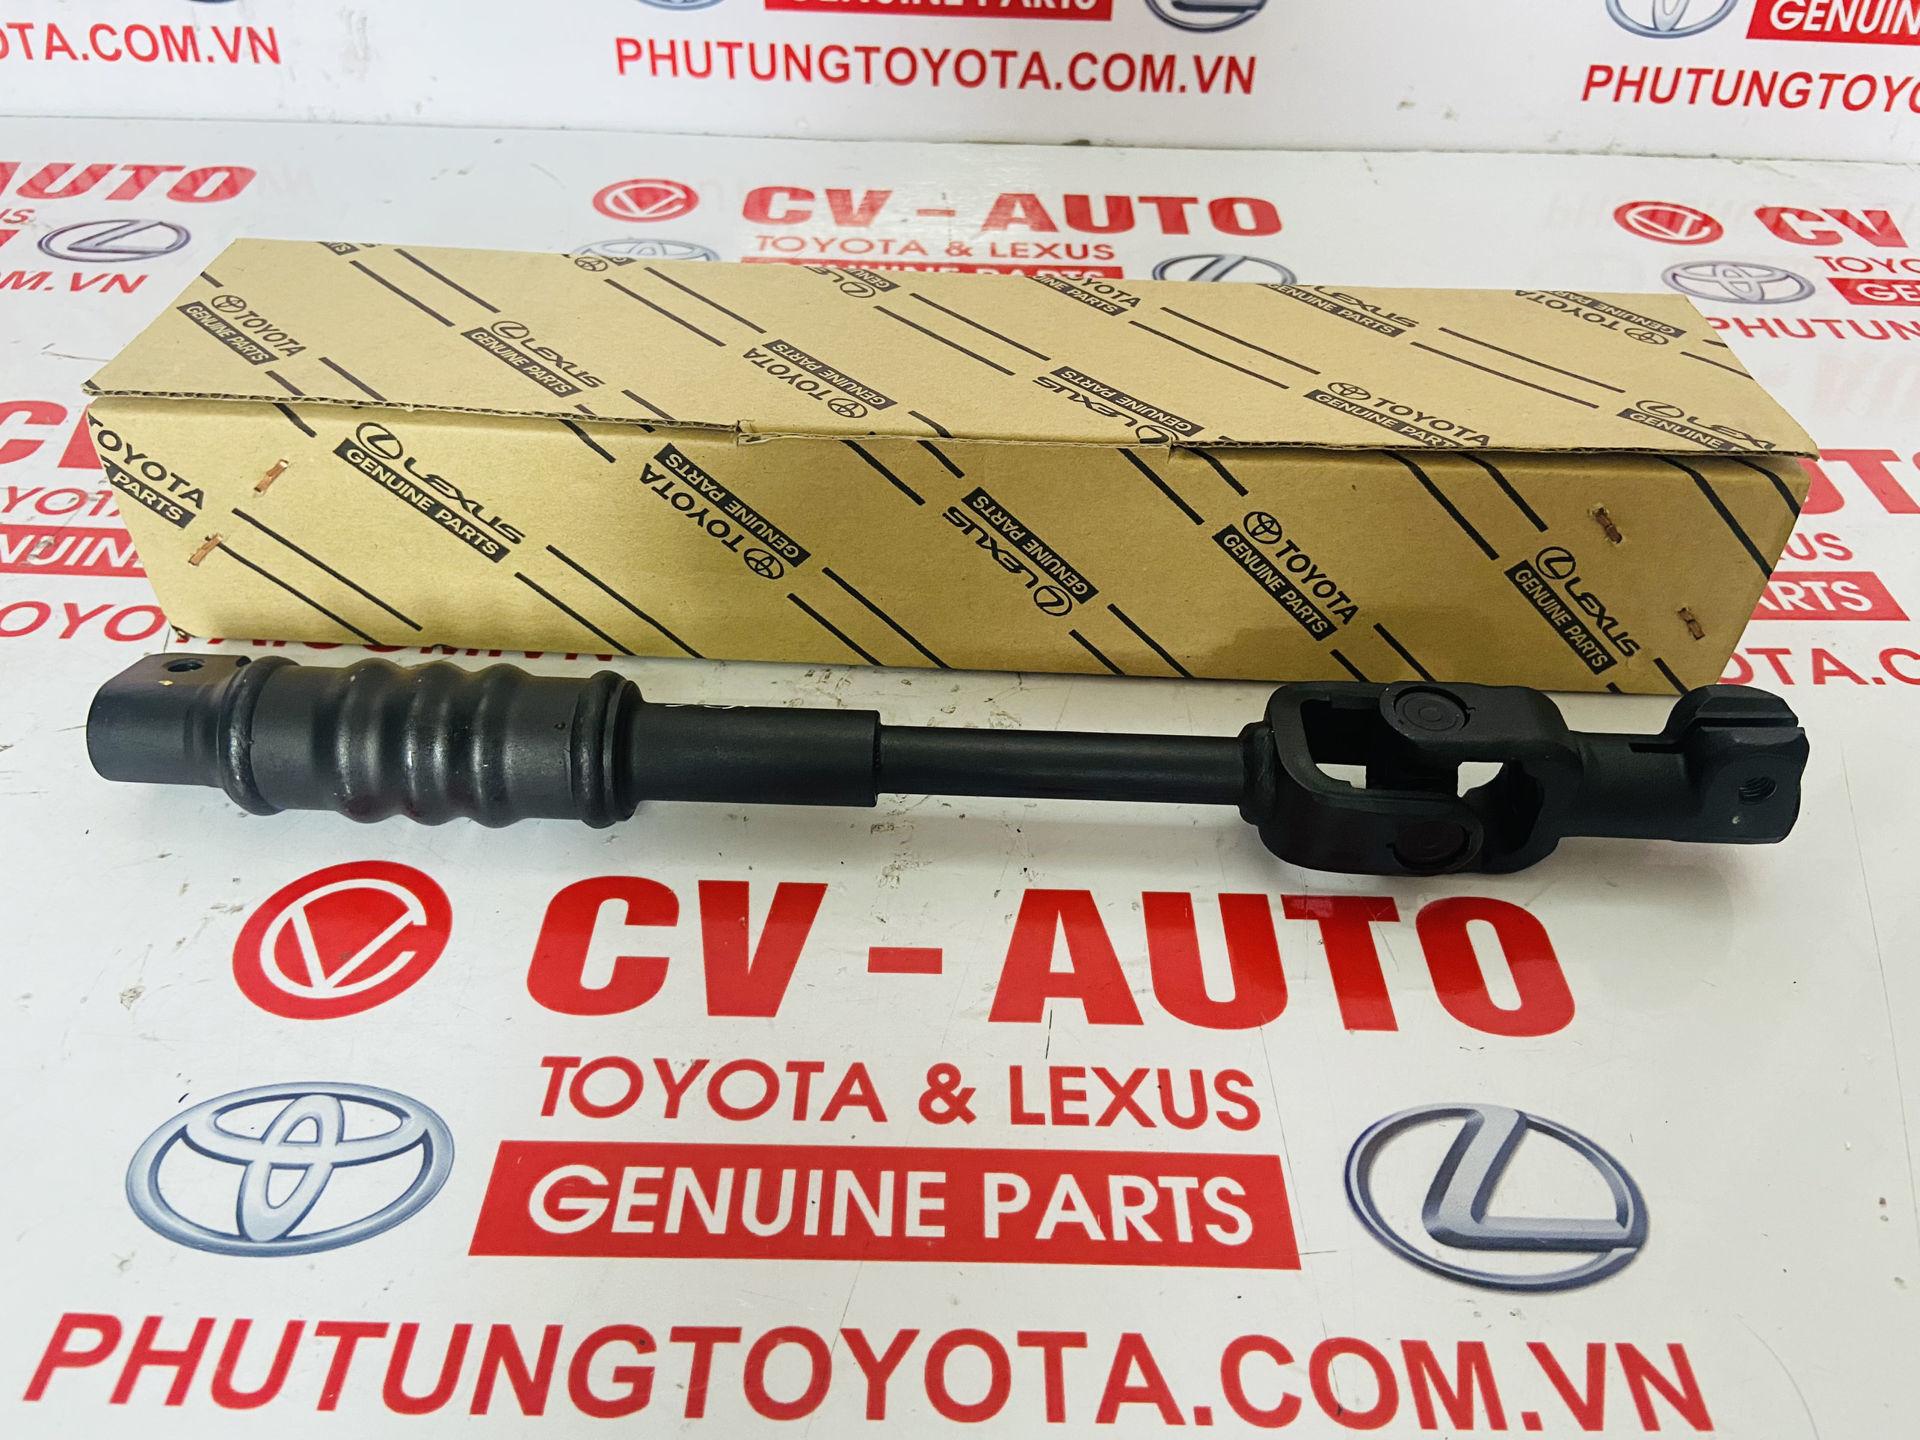 Picture of 45203-60181, 4520360181 Khớp lái dưới Lexus GX460, Toyota Prado TRJ150 chính hãng